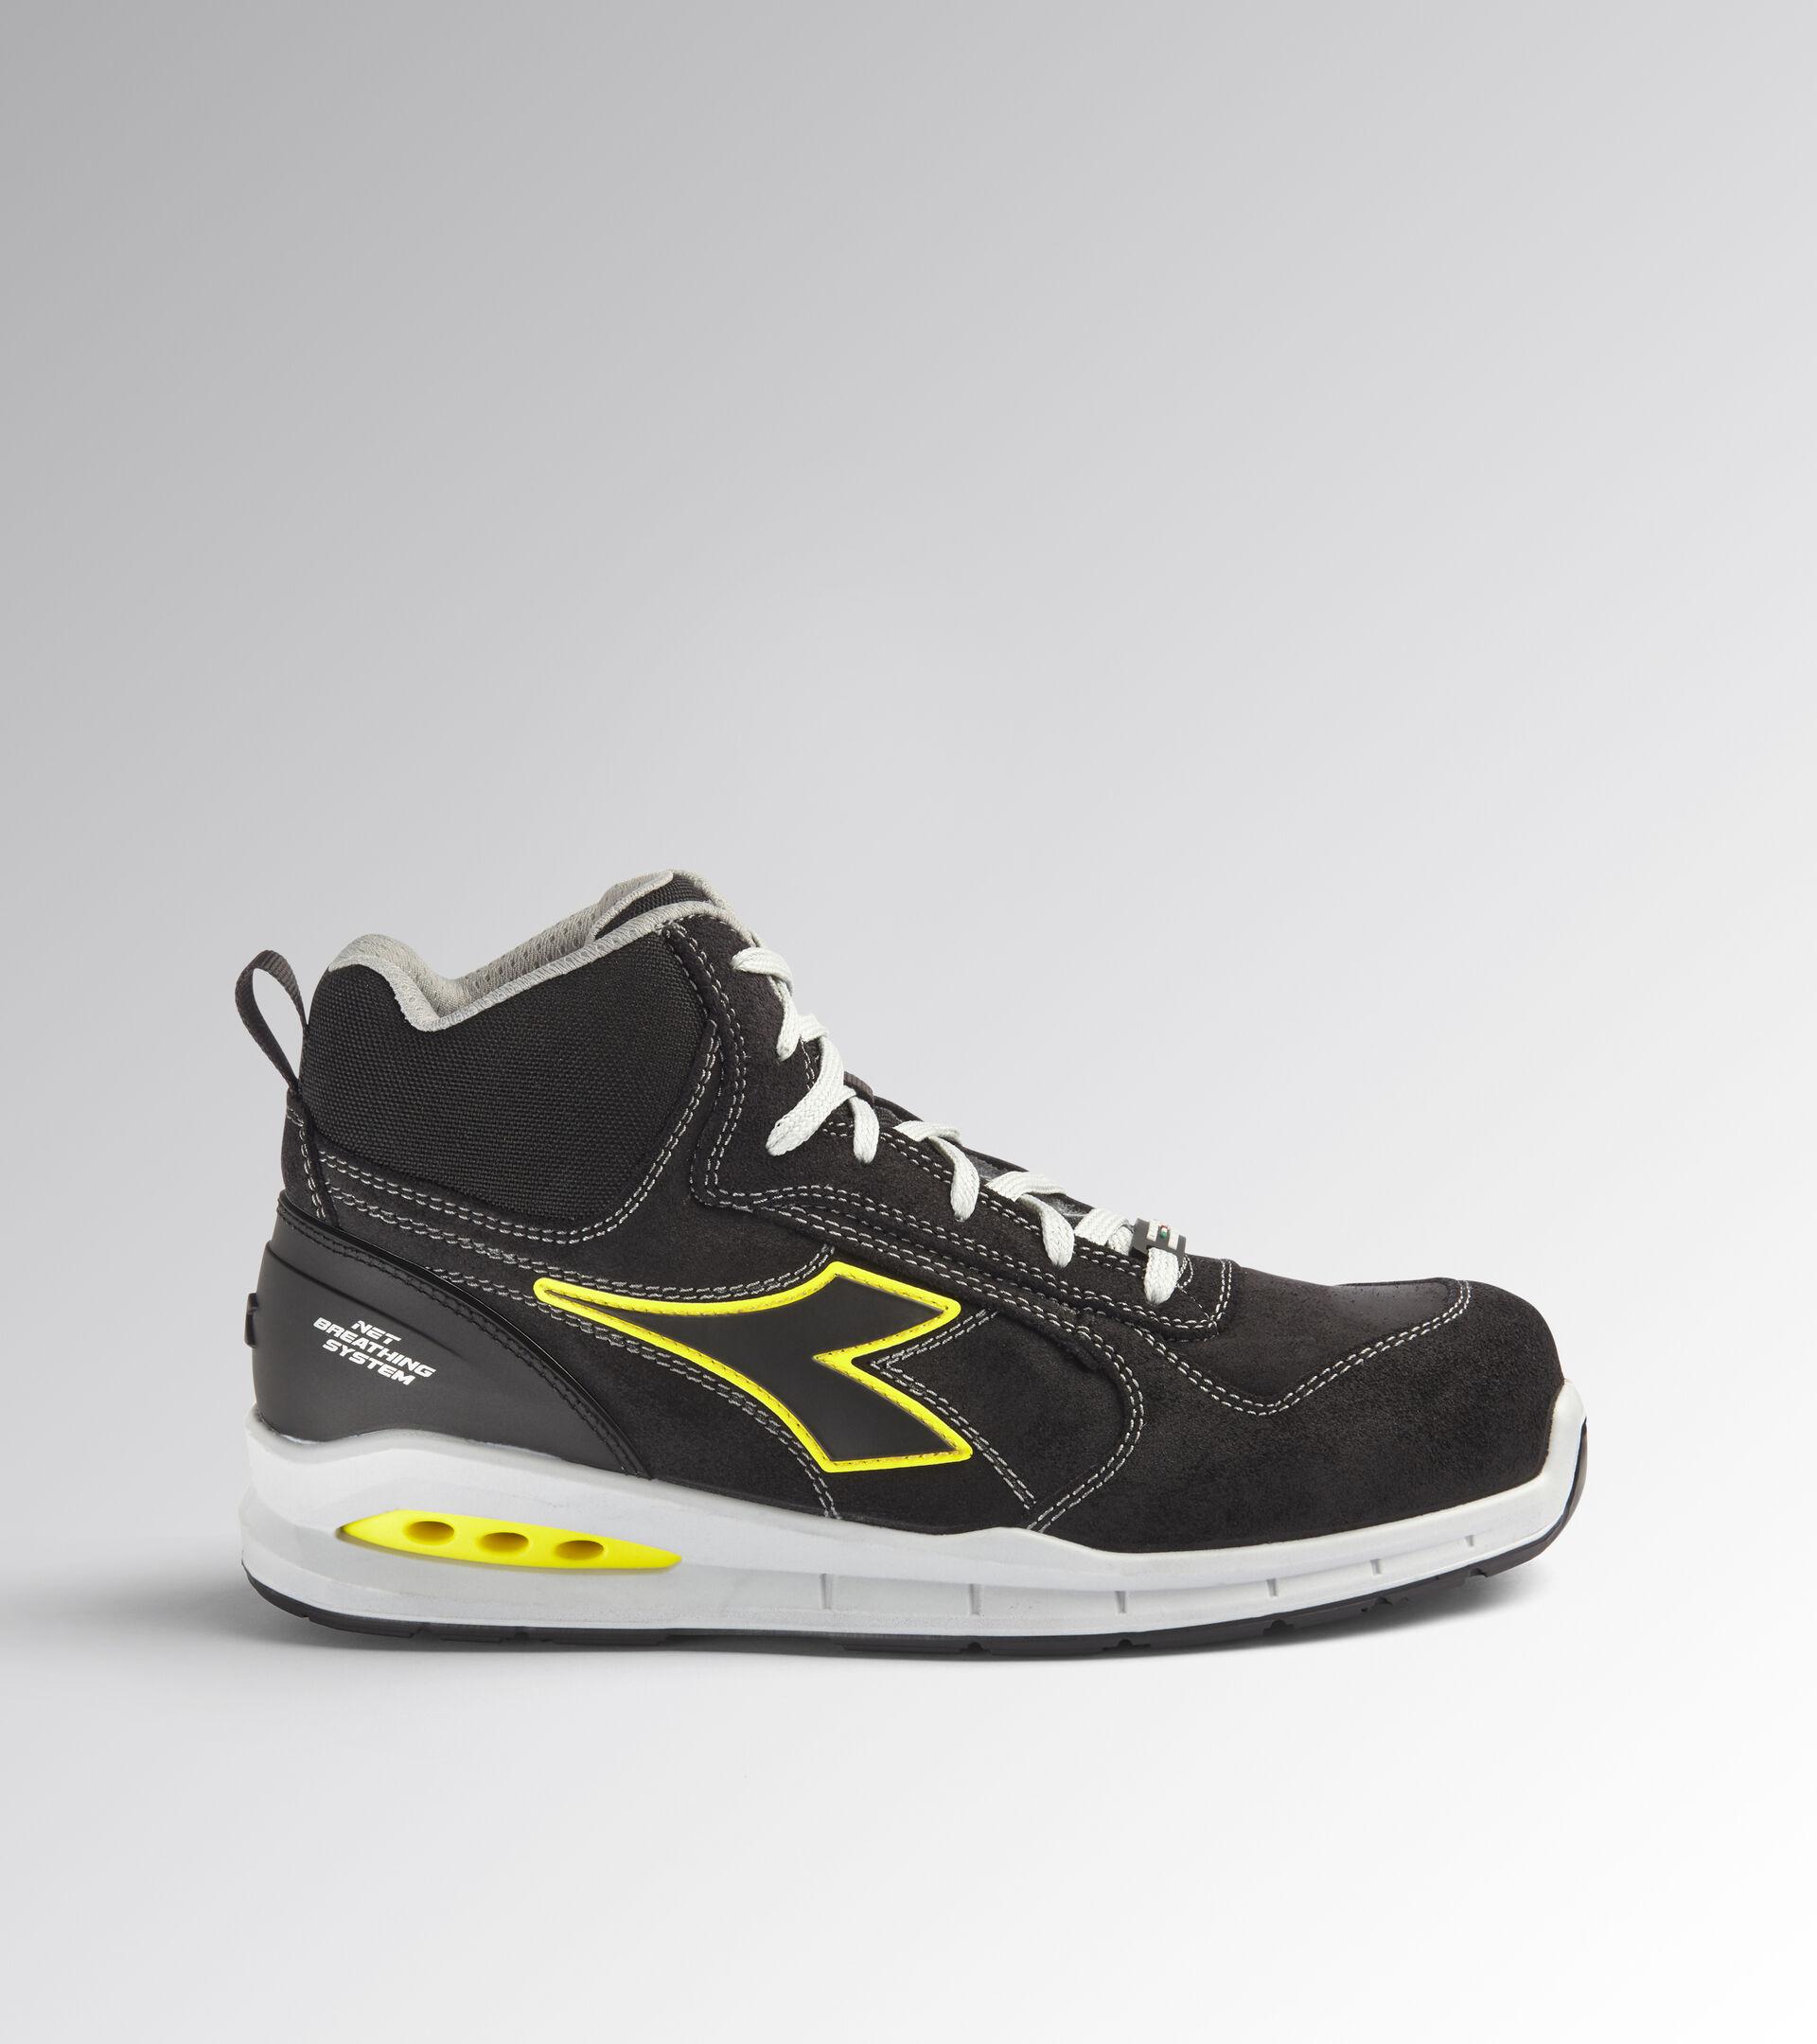 Footwear Utility UNISEX RUN NET AIRBOX MID S3 SRC BLACK /BLACK Utility